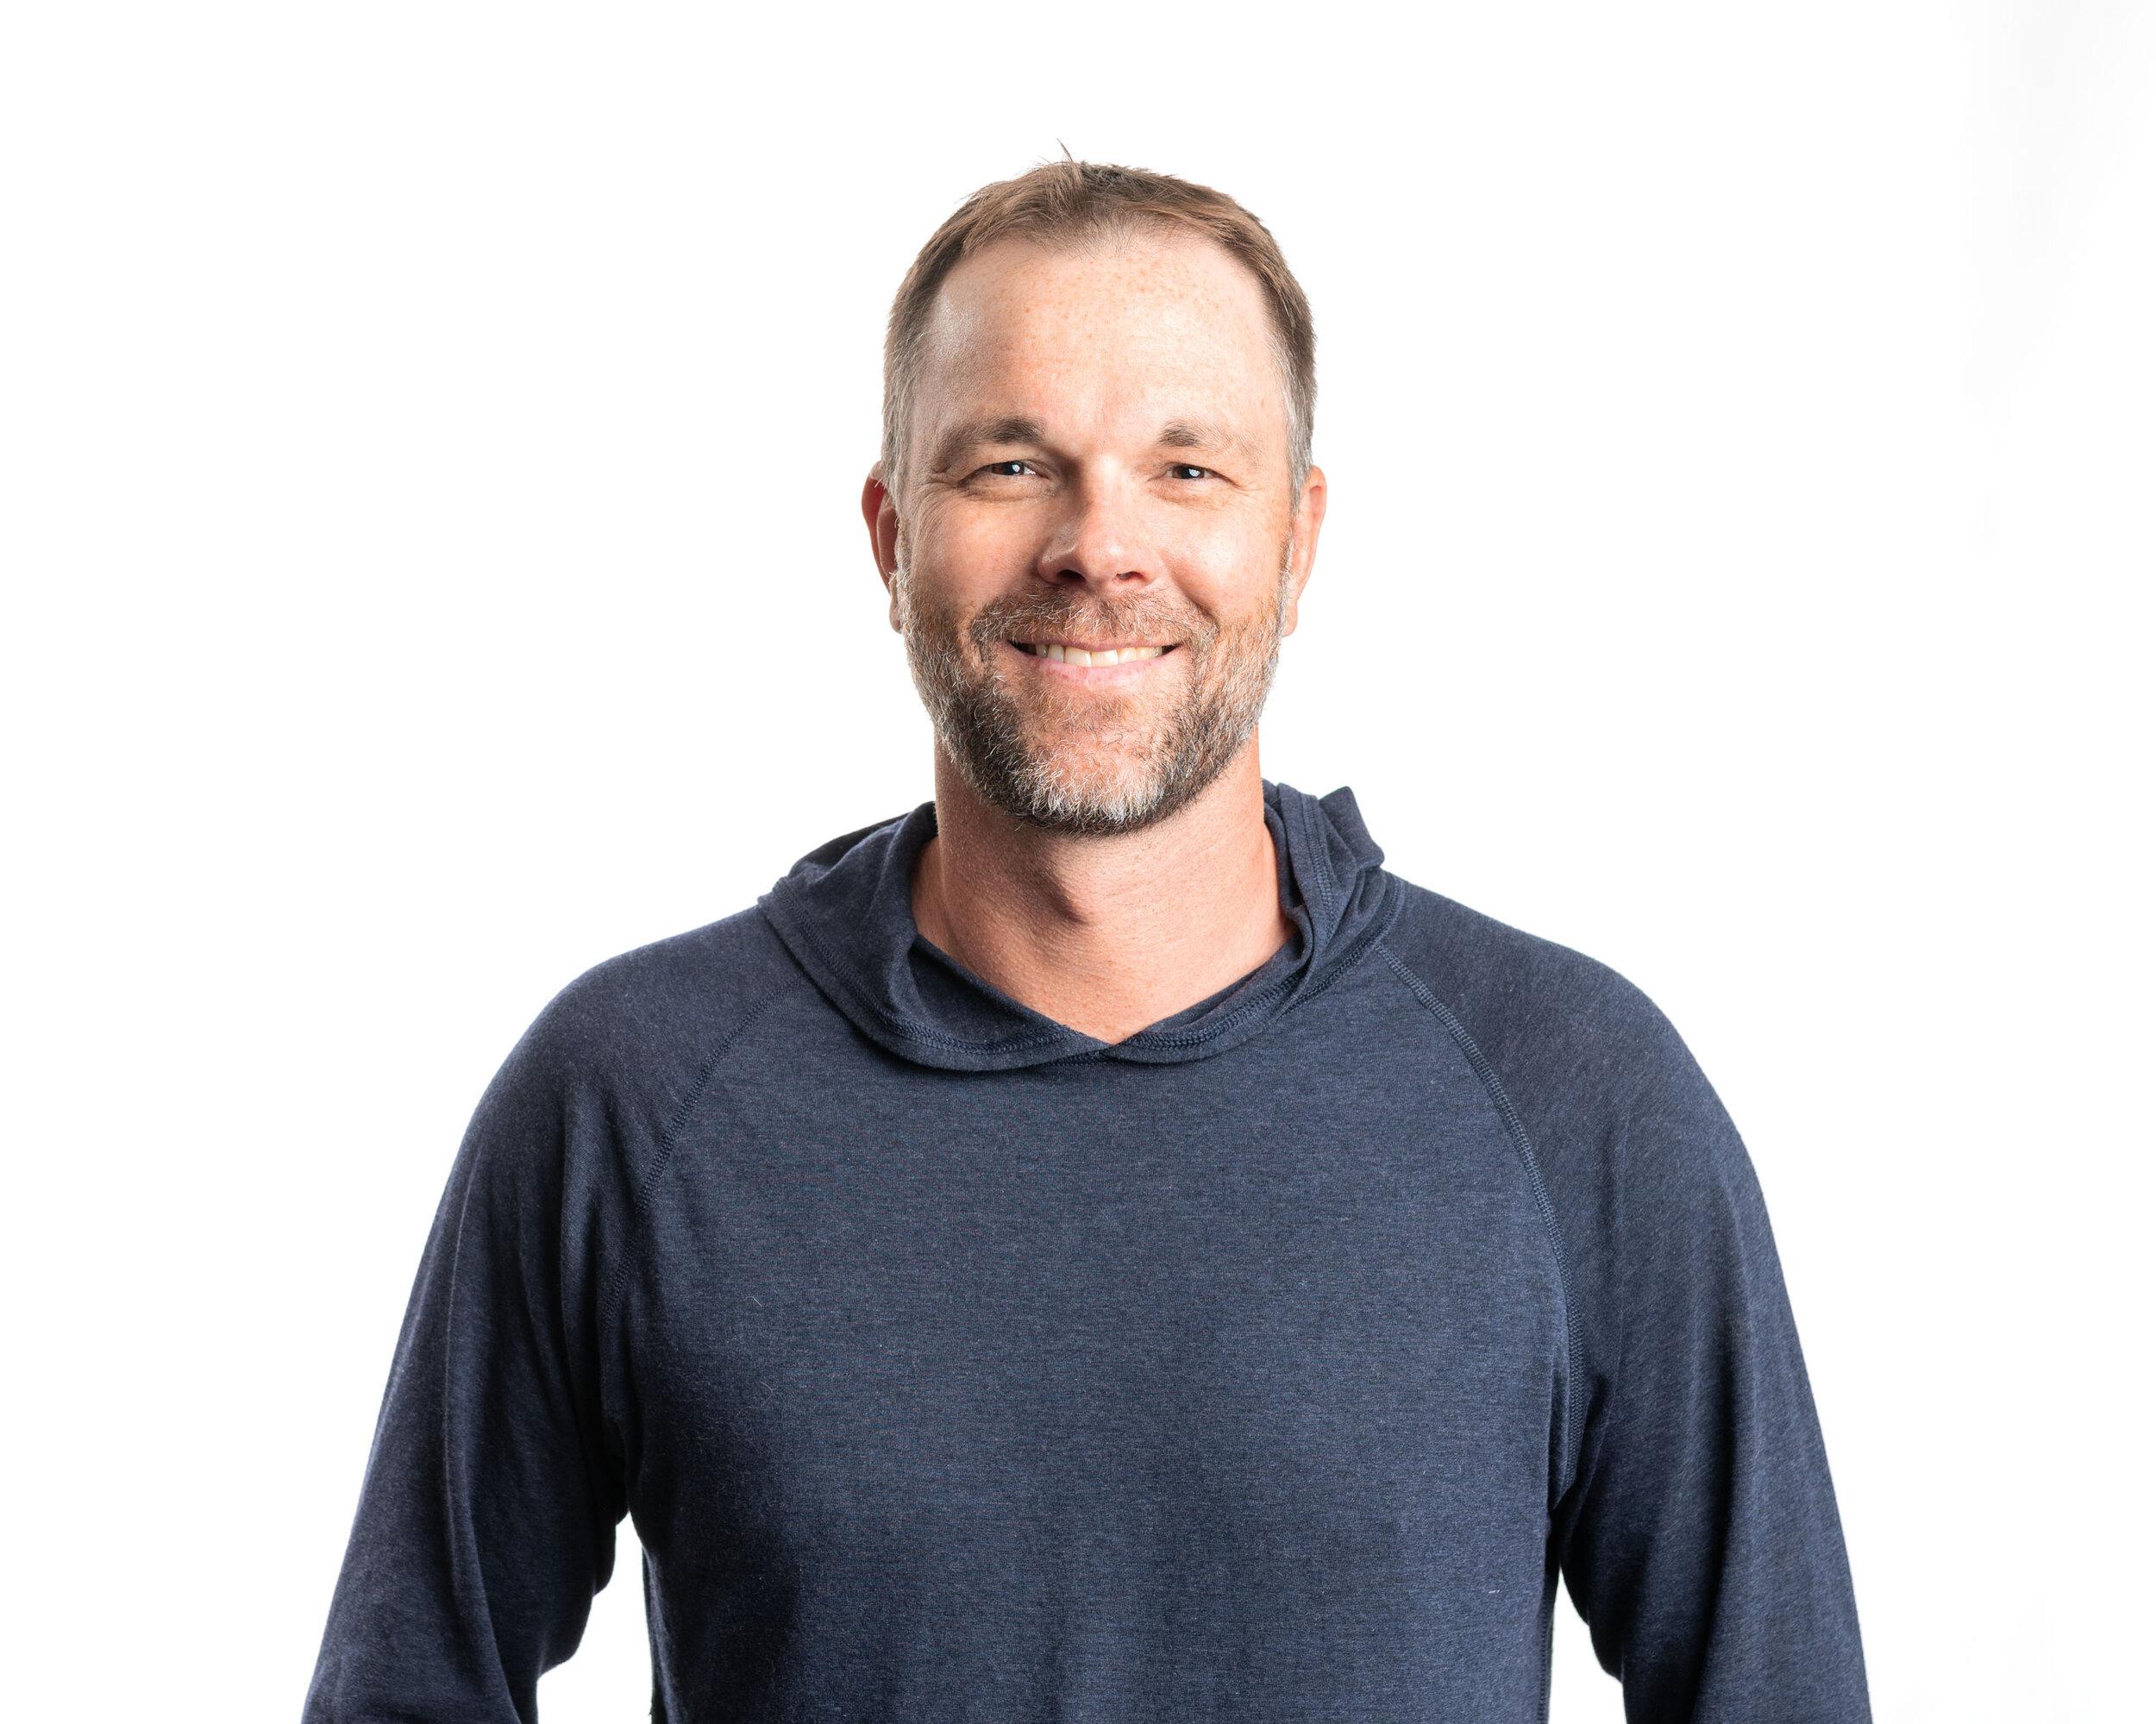 MARK SEACAT | FOUNDER | CEO